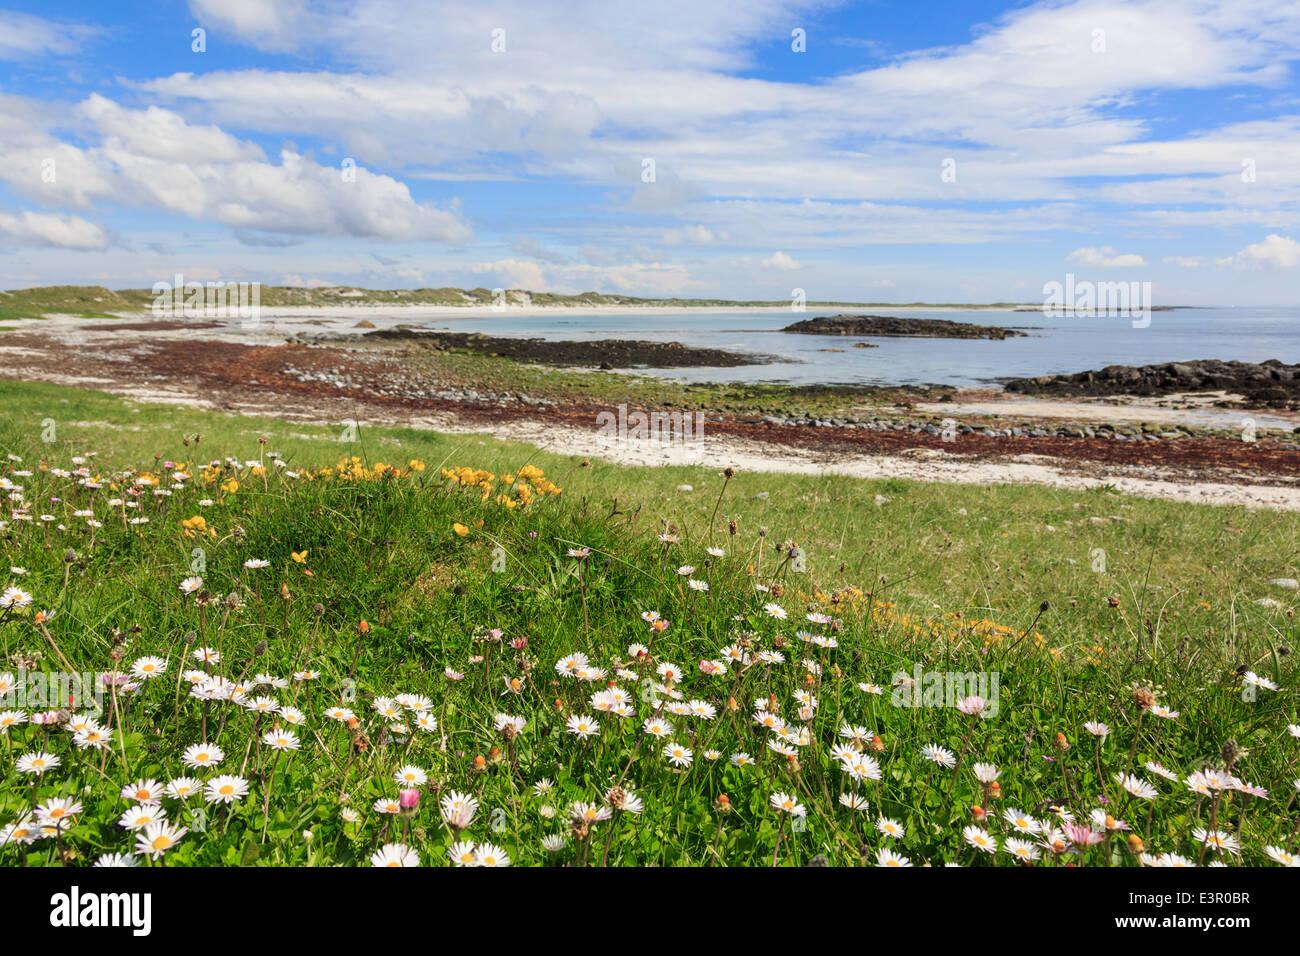 Wild flowers growing in Machair grassland on west coast. Traigh Iar beach Balranald, North Uist, Outer Hebrides, - Stock Image